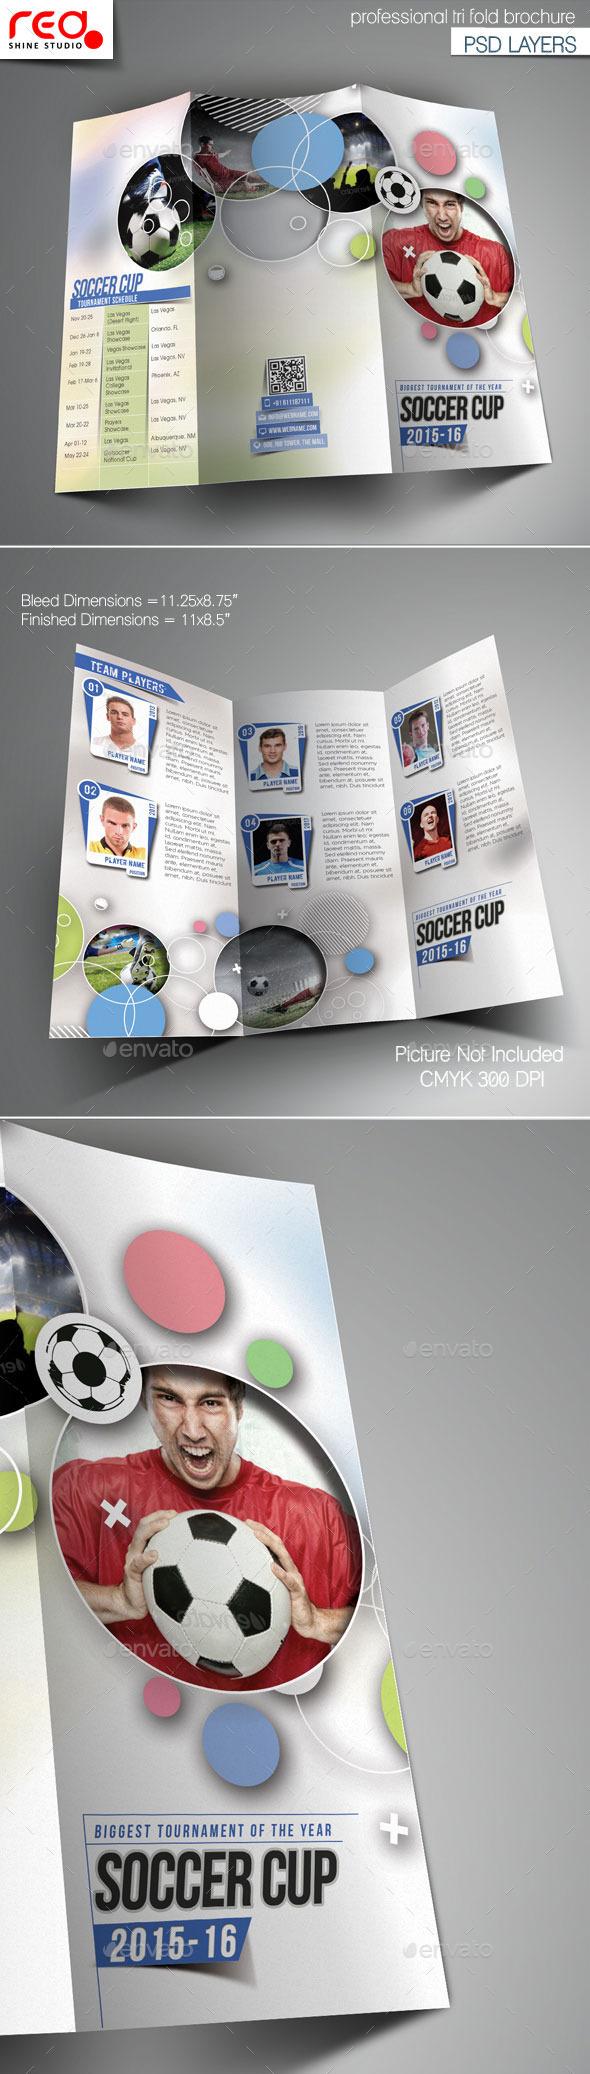 GraphicRiver Sport Multipurpose Trifold Brochure Template 11221788